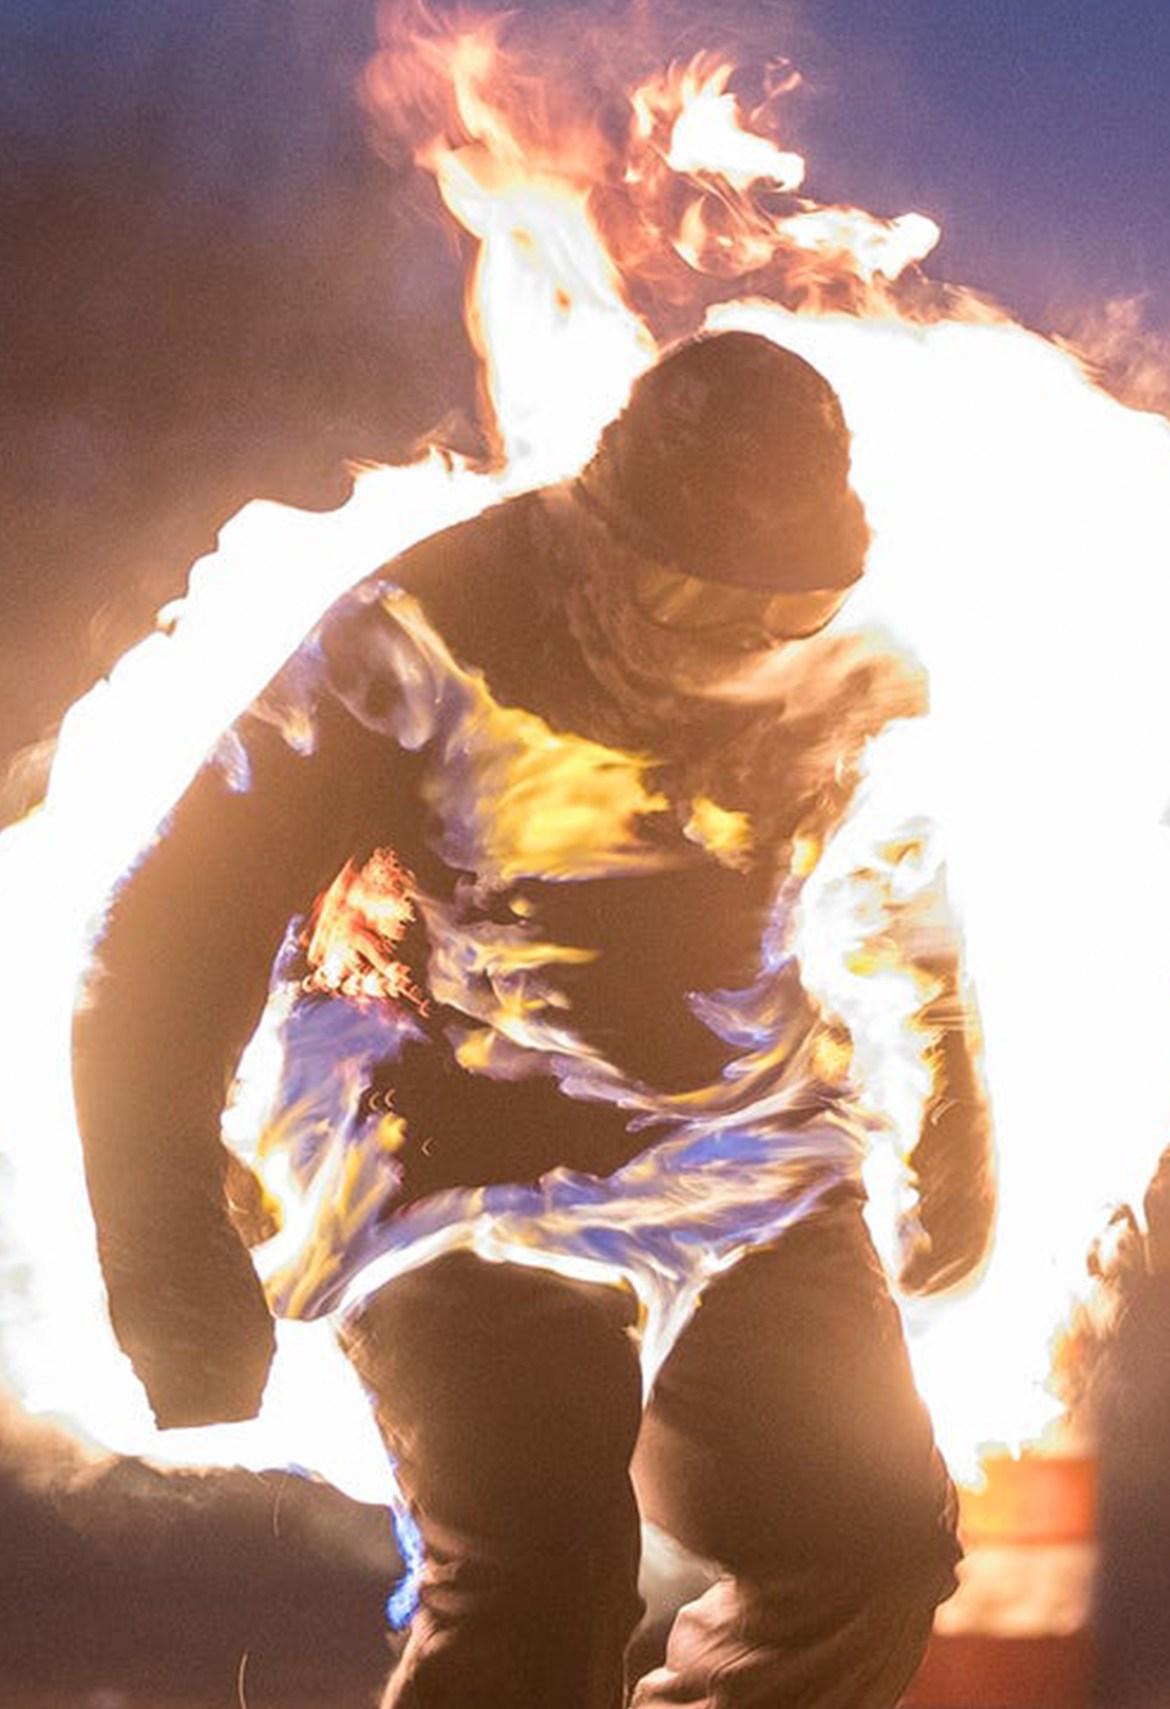 Homegrown Stunts: The Underground World Of Daring Online Stunts